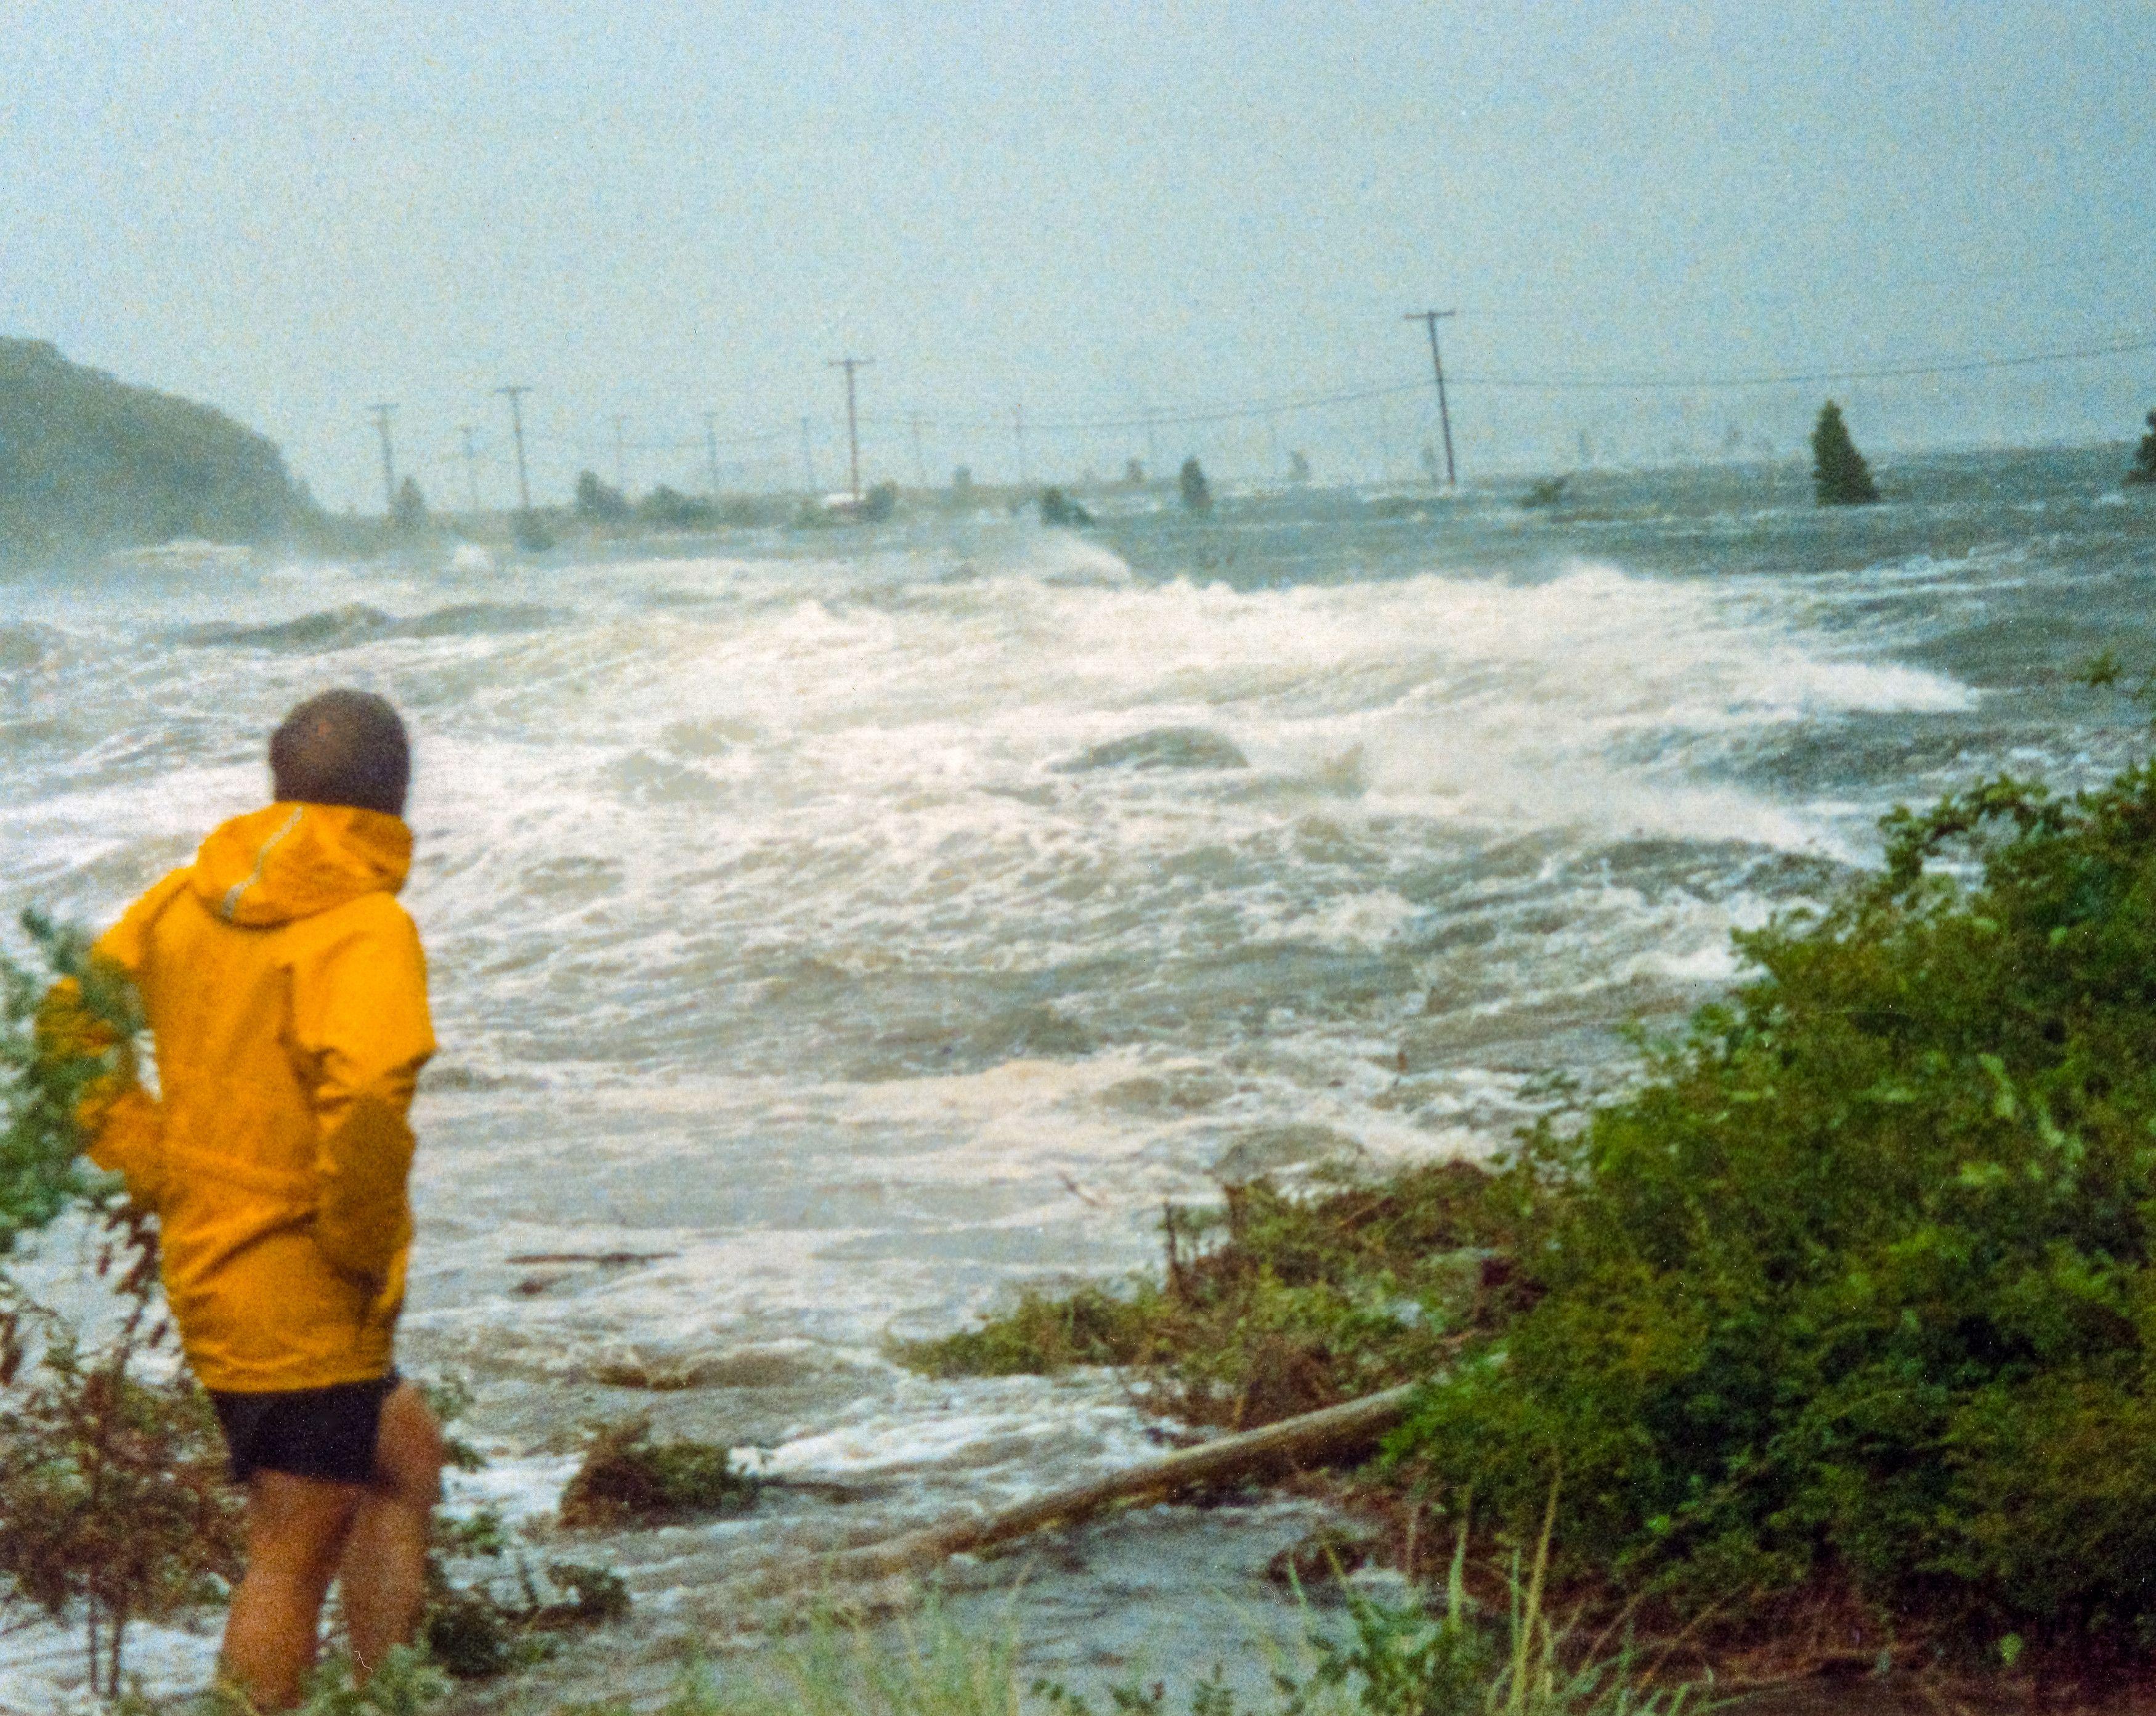 Hurricane Bob Causeway Storm Surge Cape Cod Massachusetts Island